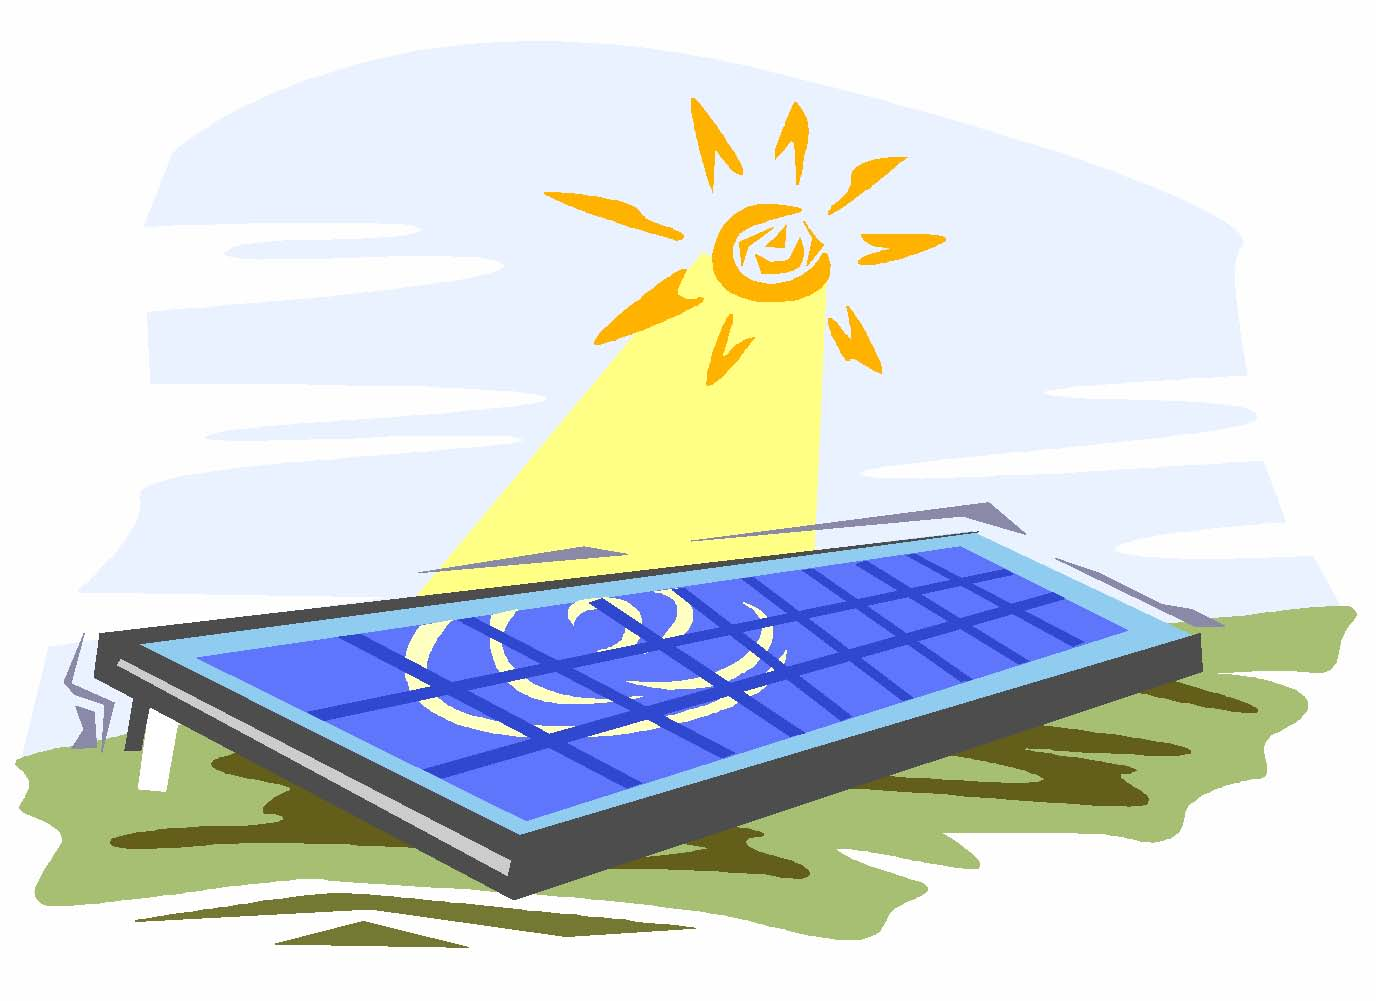 Solar Panel Clip Art Jpg-Solar Panel Clip Art Jpg-4